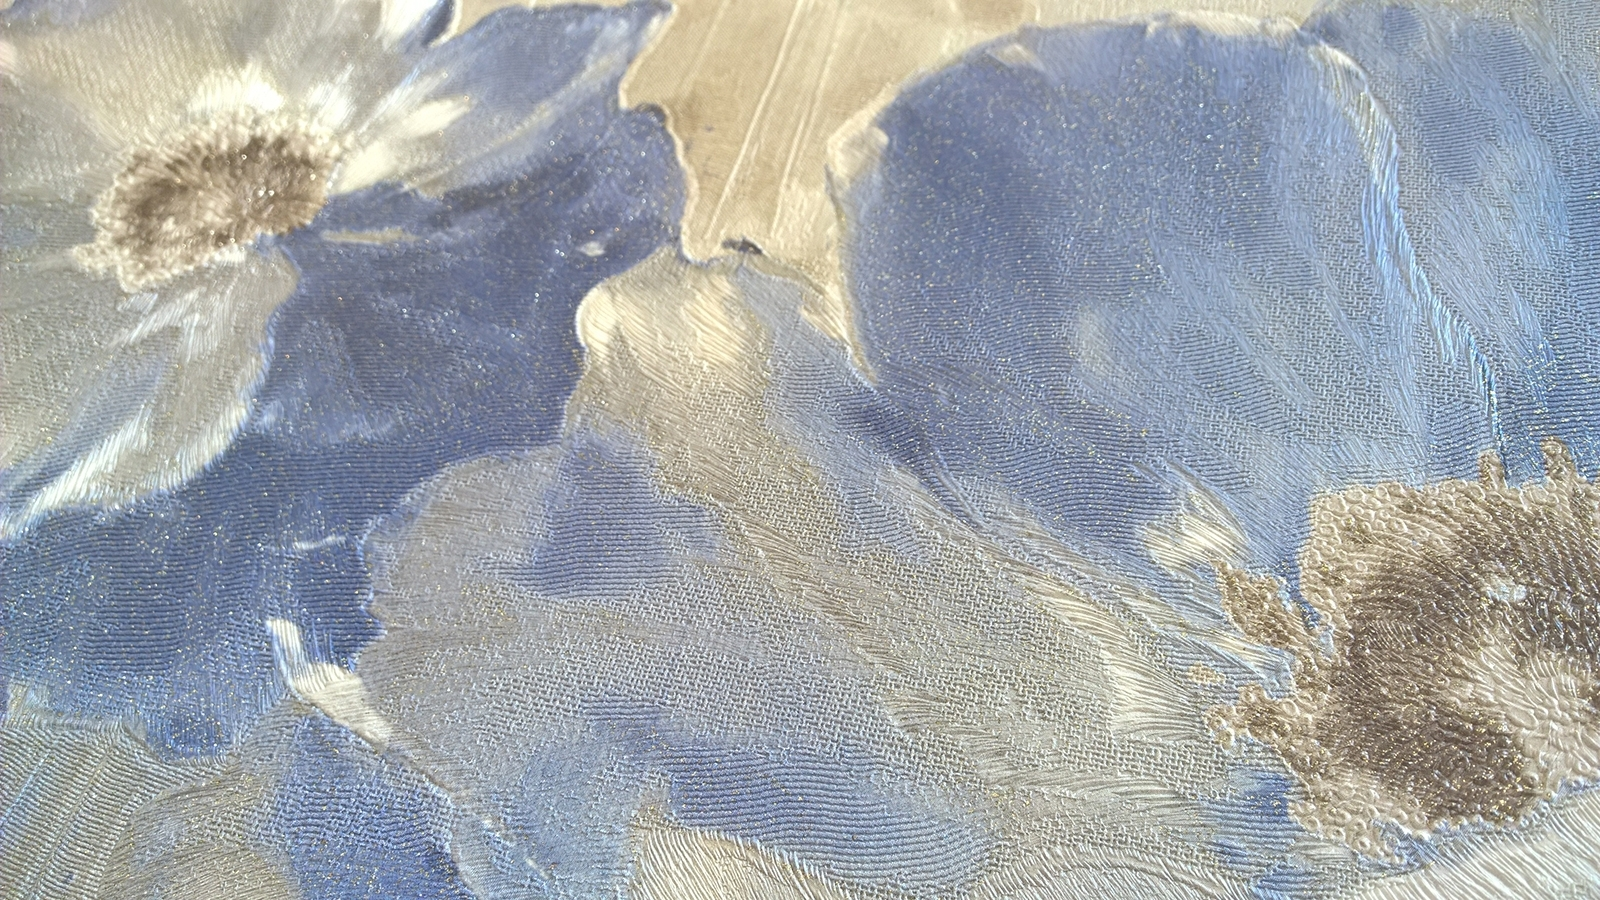 tapet-din-vinil-lavabil-cu-flori-albastre-pentru-dormitor-si-living-gama-victoria-7